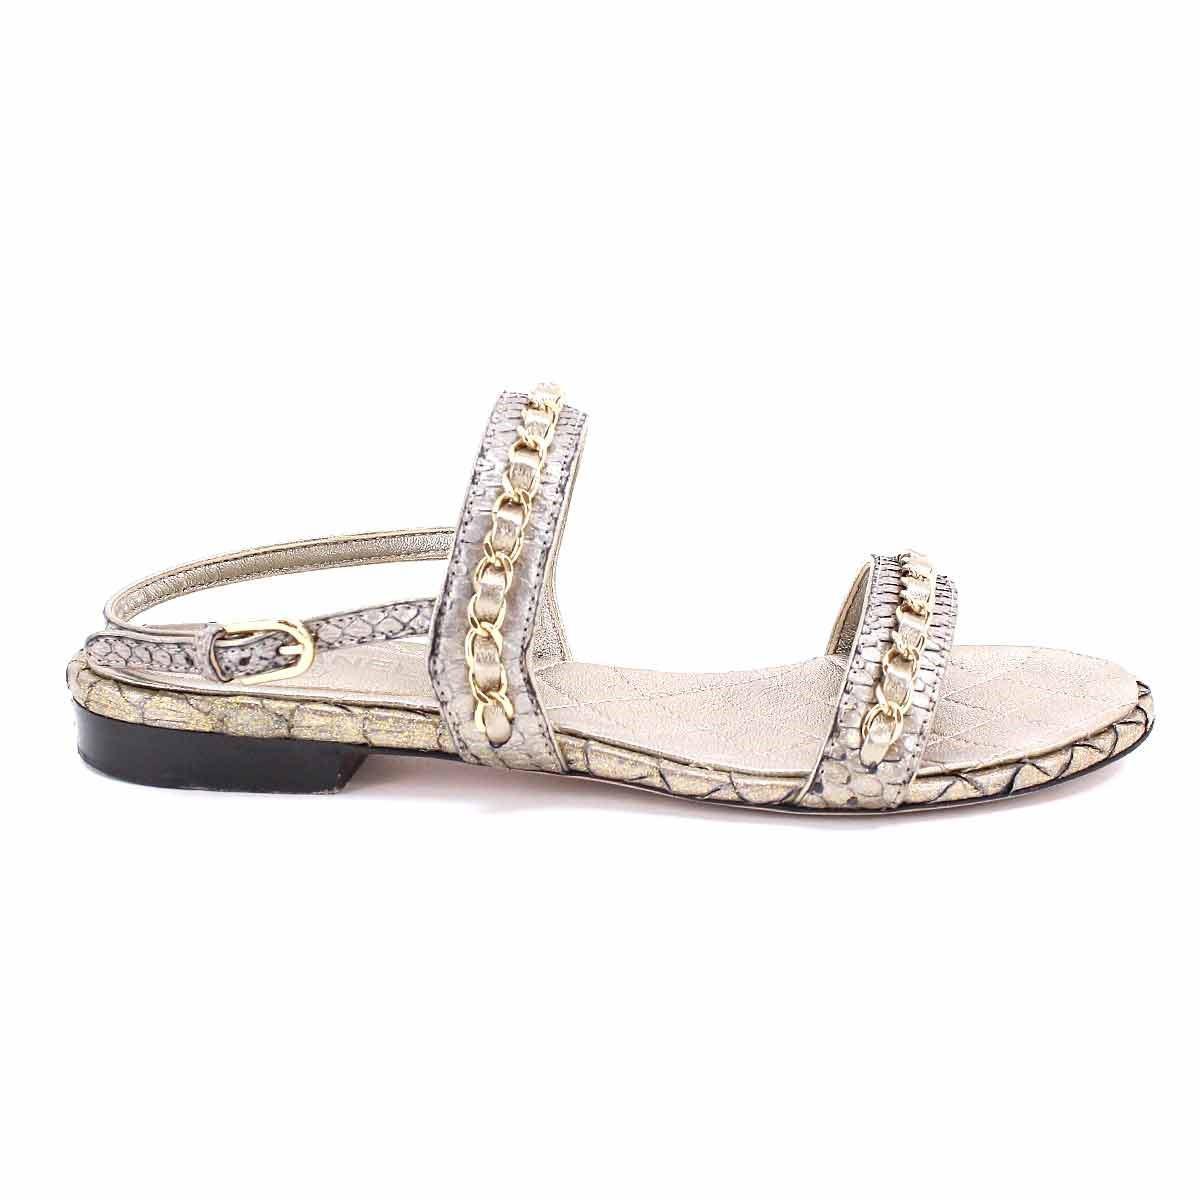 44328d3ddd51 Lyst - Chanel Chain Flat Sandals Leather Gold 35.5 Women s 90045859 ...